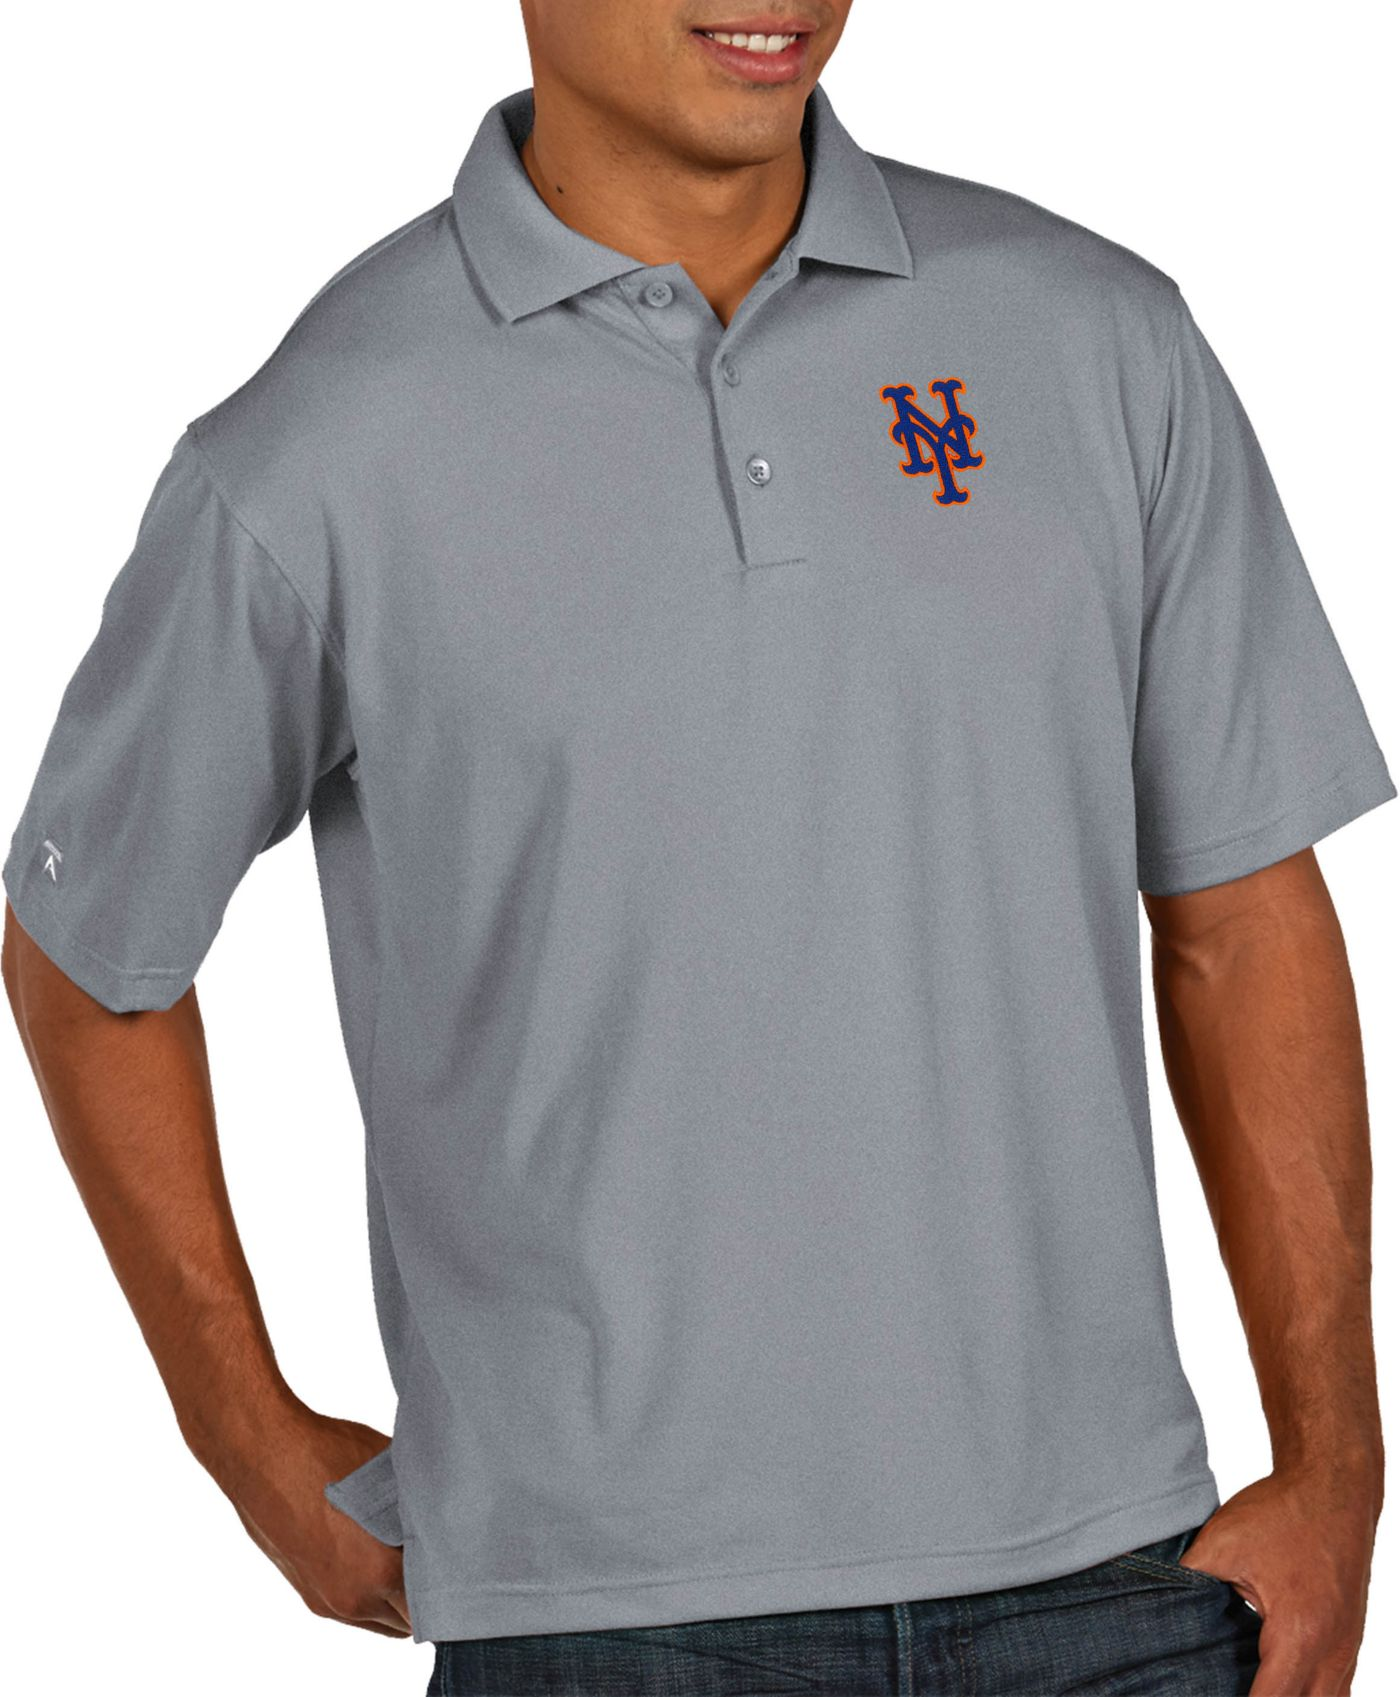 Antigua Men's New York Mets Pique Grey Performance Polo